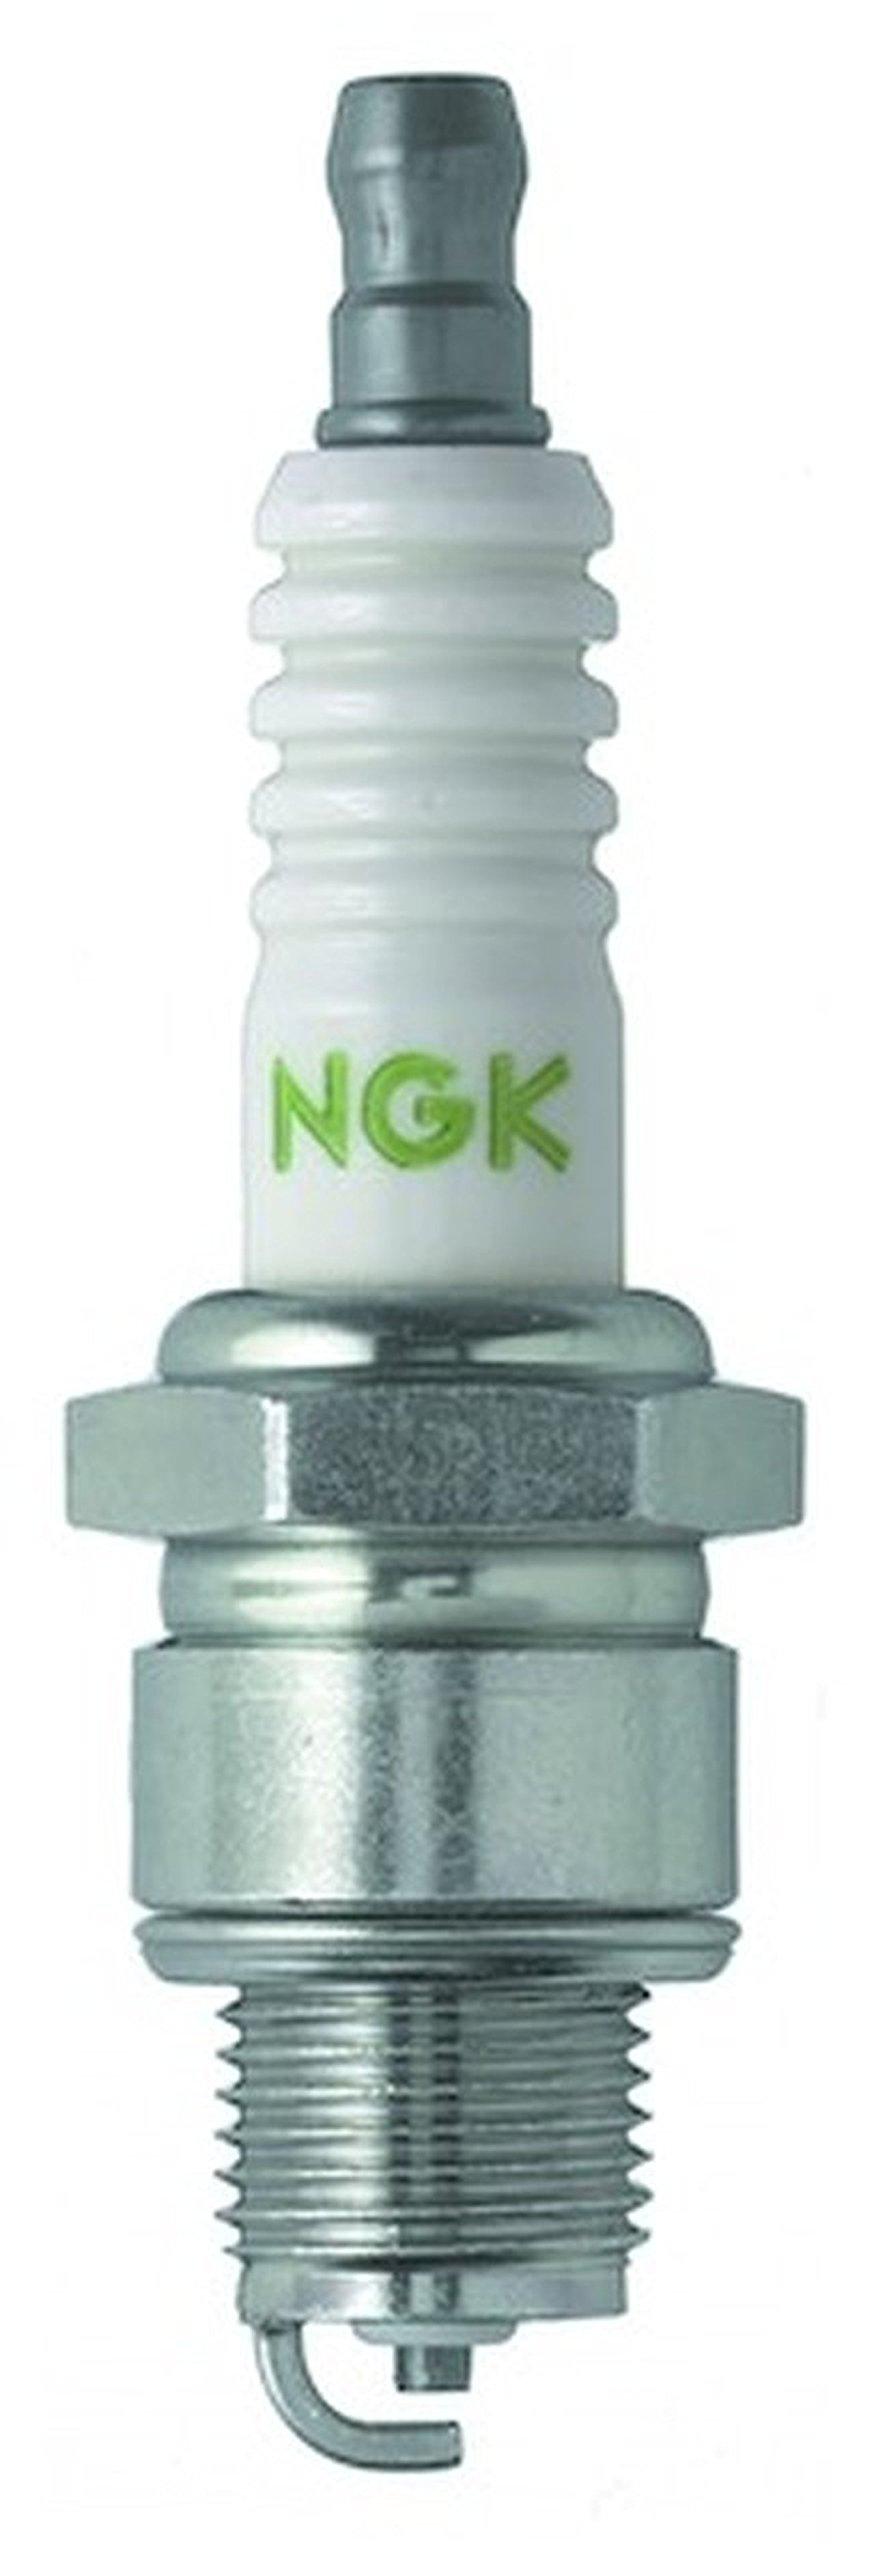 Set (10pcs) NGK V-Power Spark Plugs Stock 4838 Nickel Core Tip Special Side Ground 0.040in BP8H-N-10